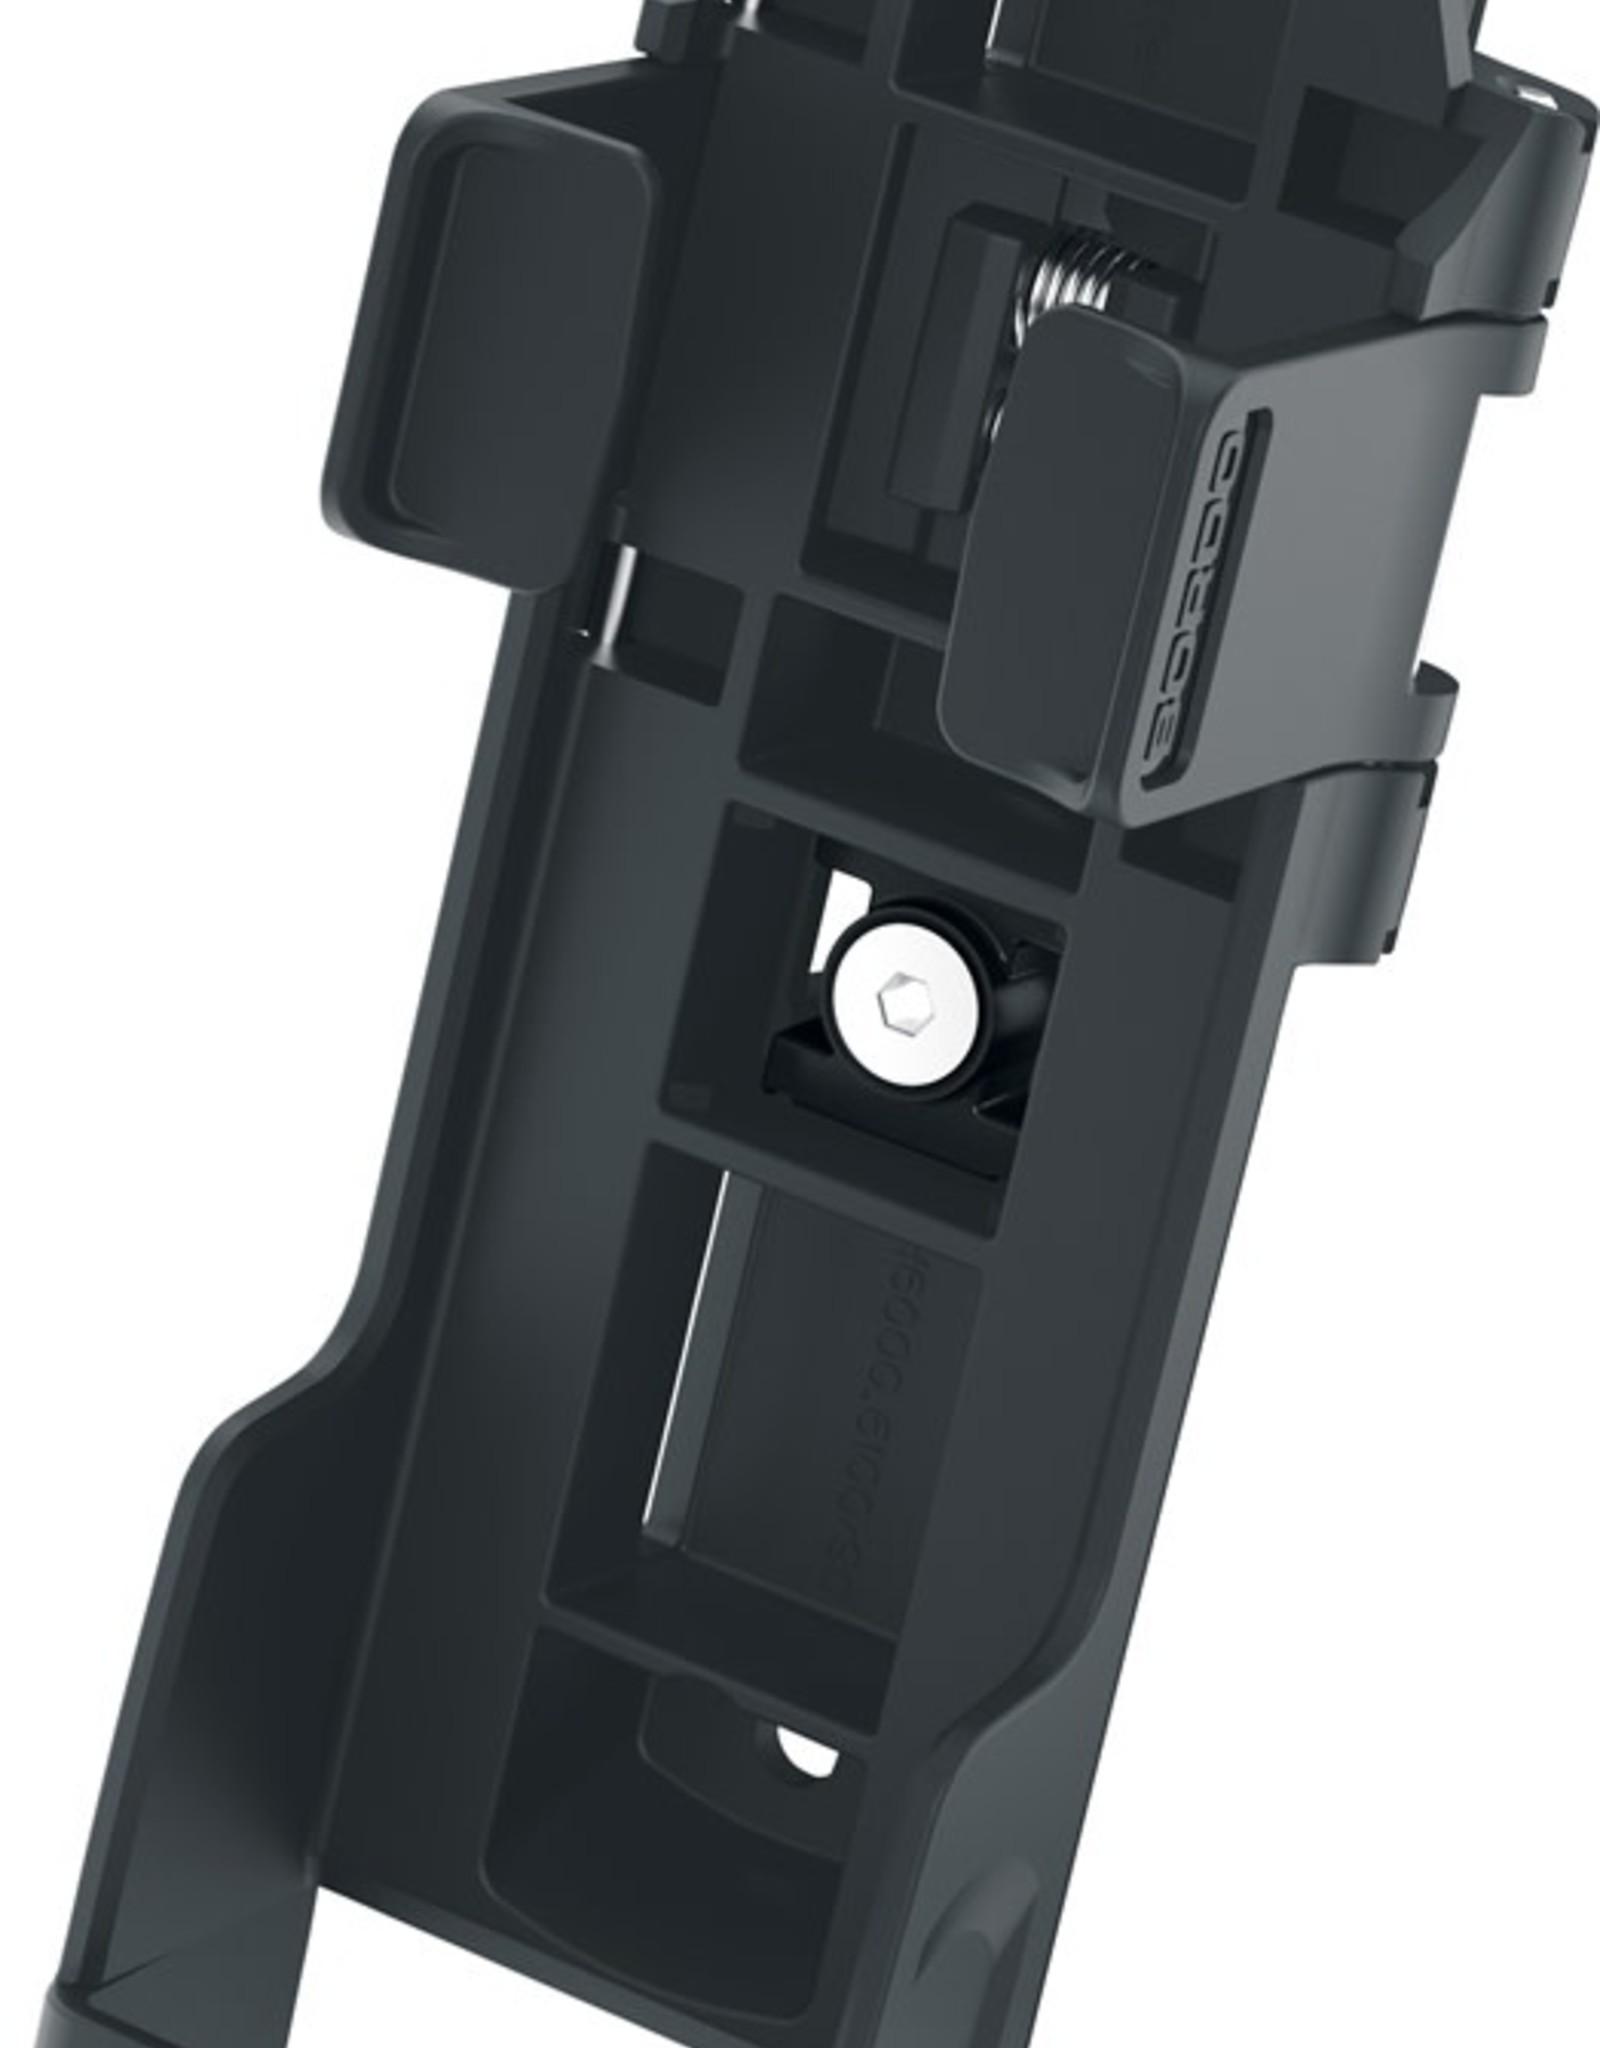 ABUS ABUS Folding Lock - uGrip BORDO 5700 COMBO - 2.6 Feet - Black